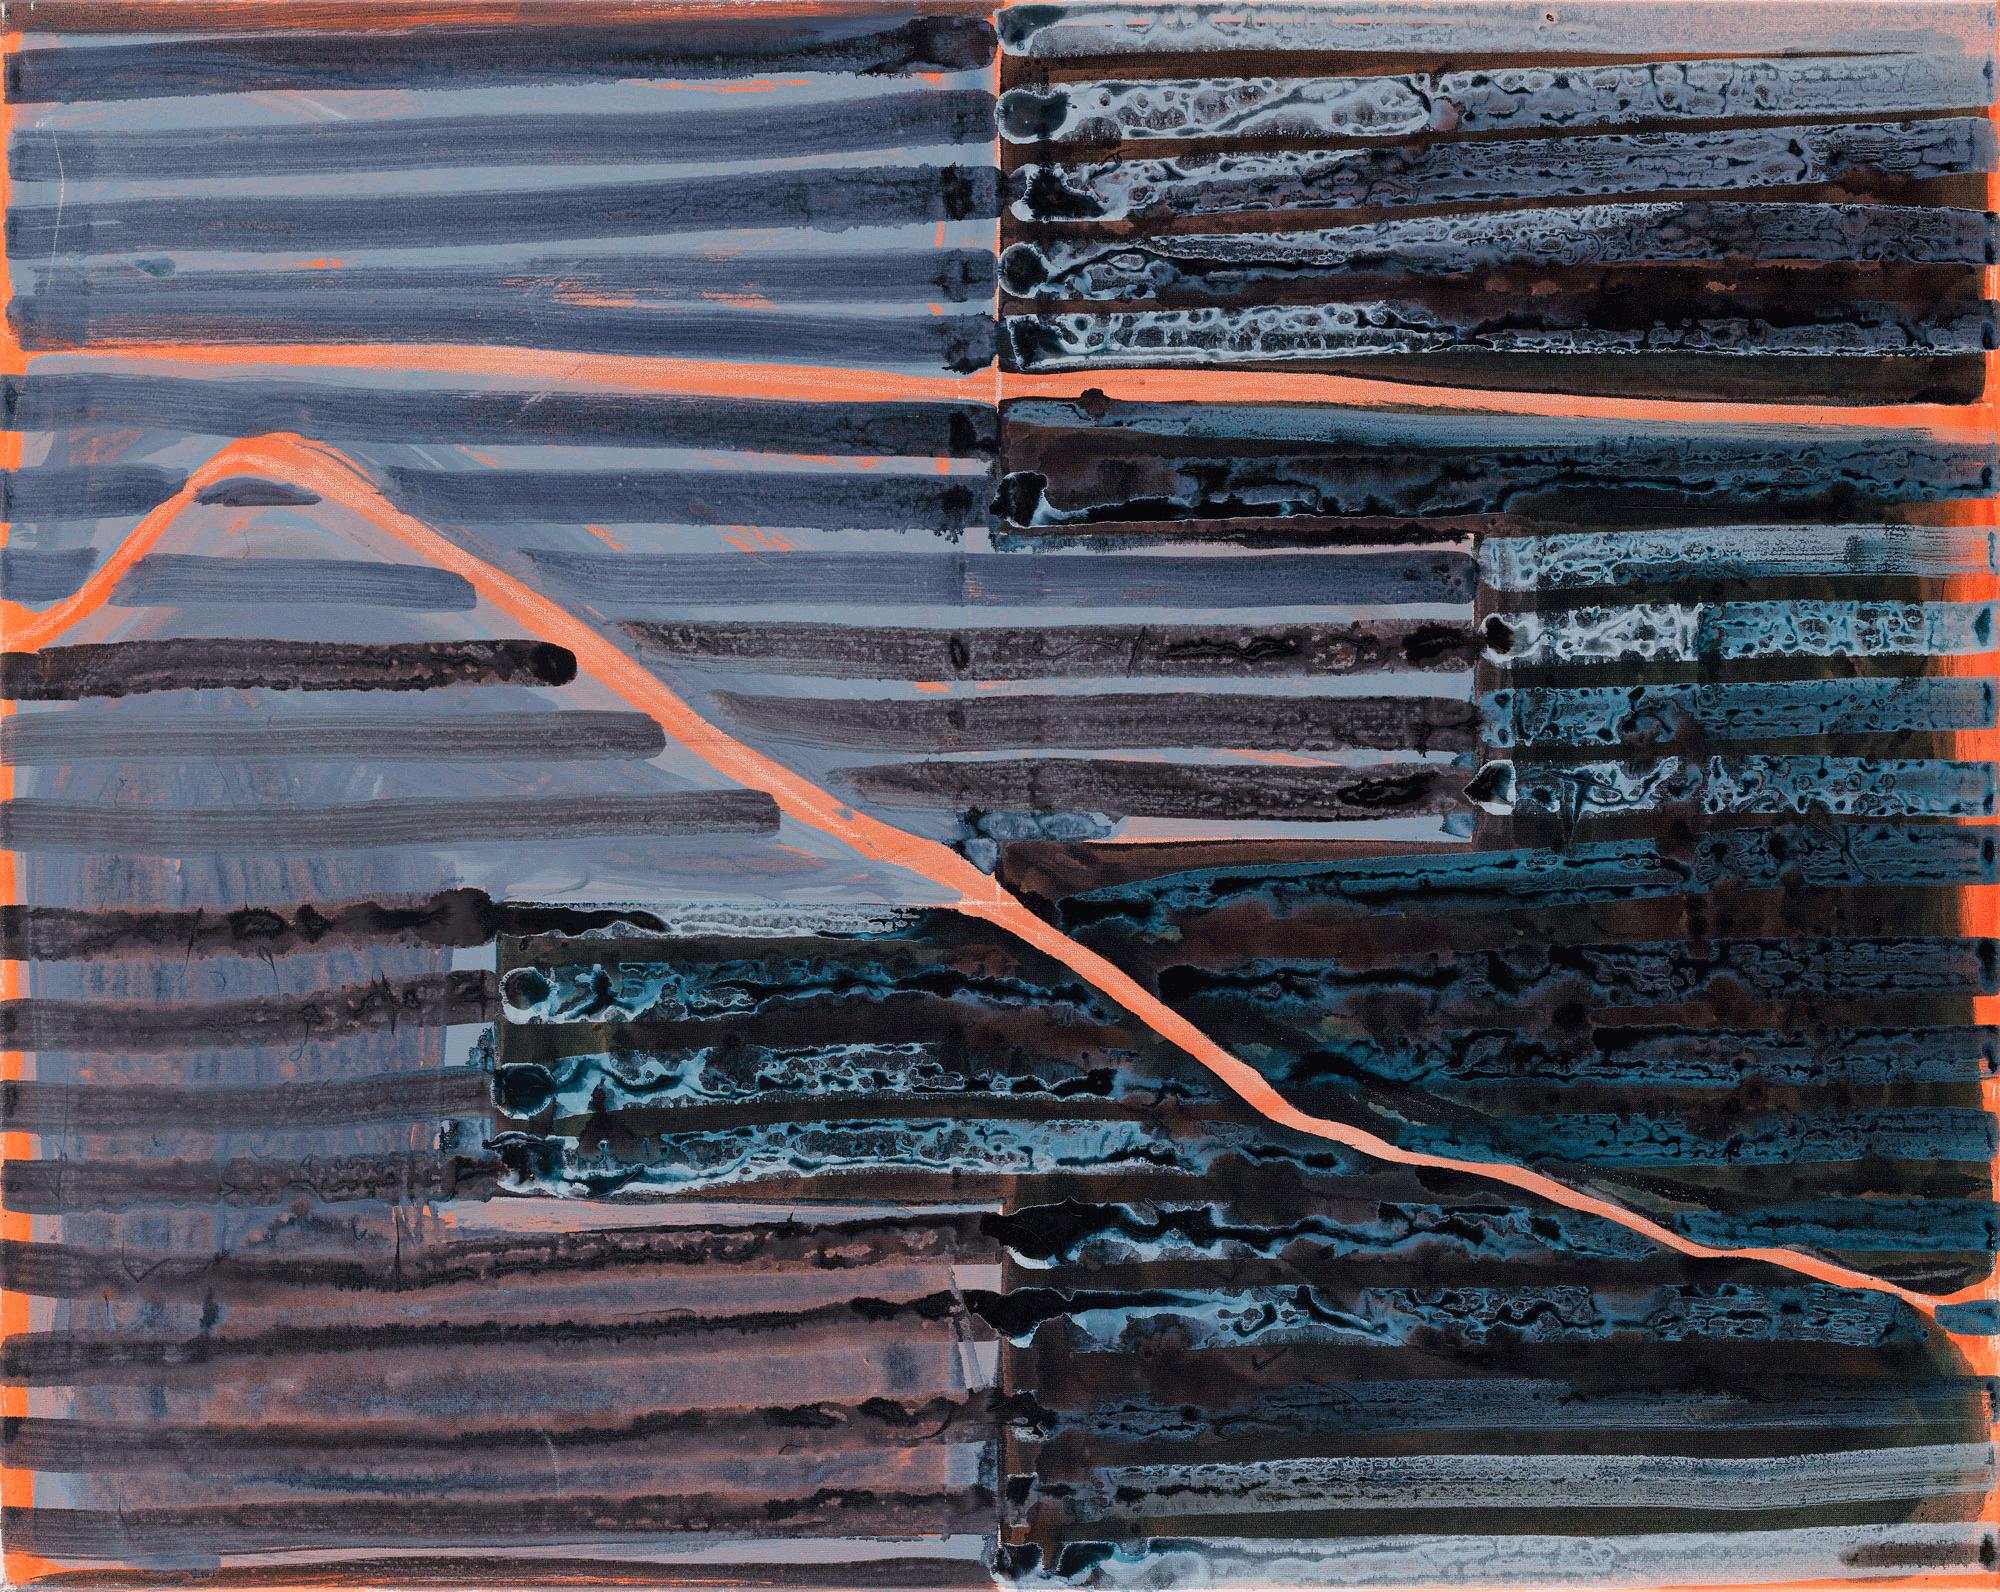 Yvonne Andreini, (Landscape) Outsight II, 2019, 80x100cm, Tusche auf Leinwand